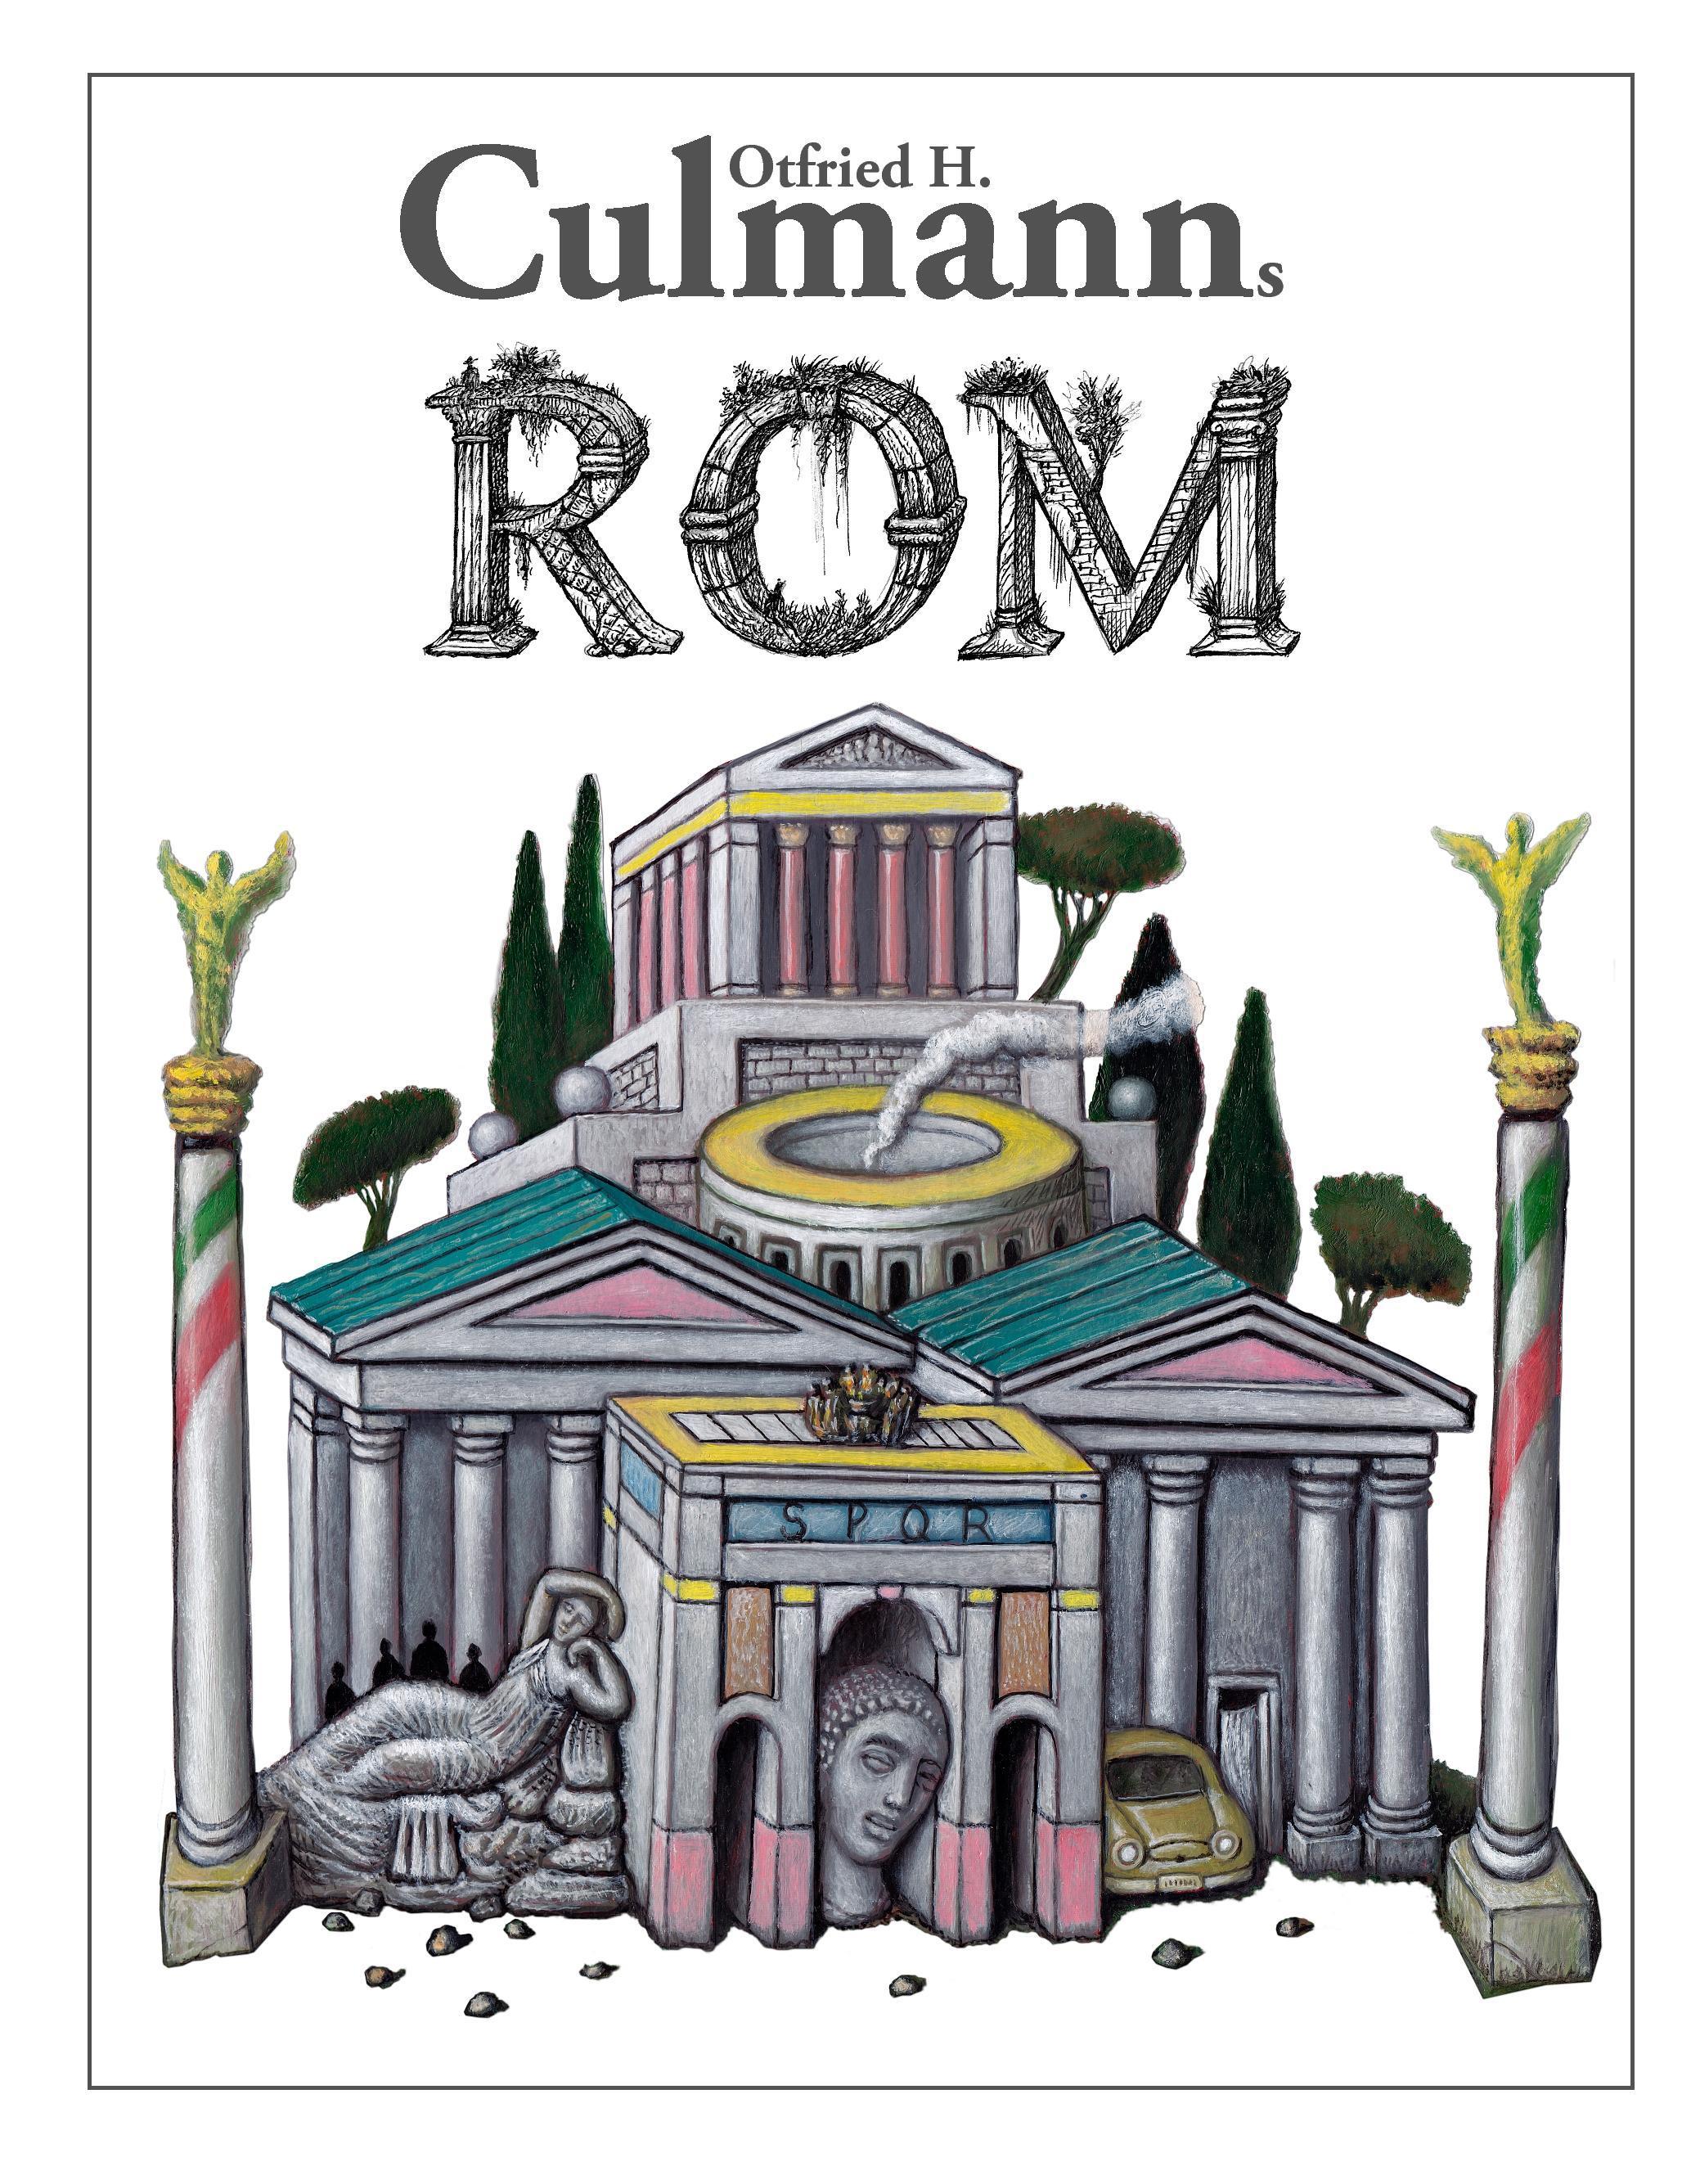 Culmanns Rom Culmann, Otfried H.